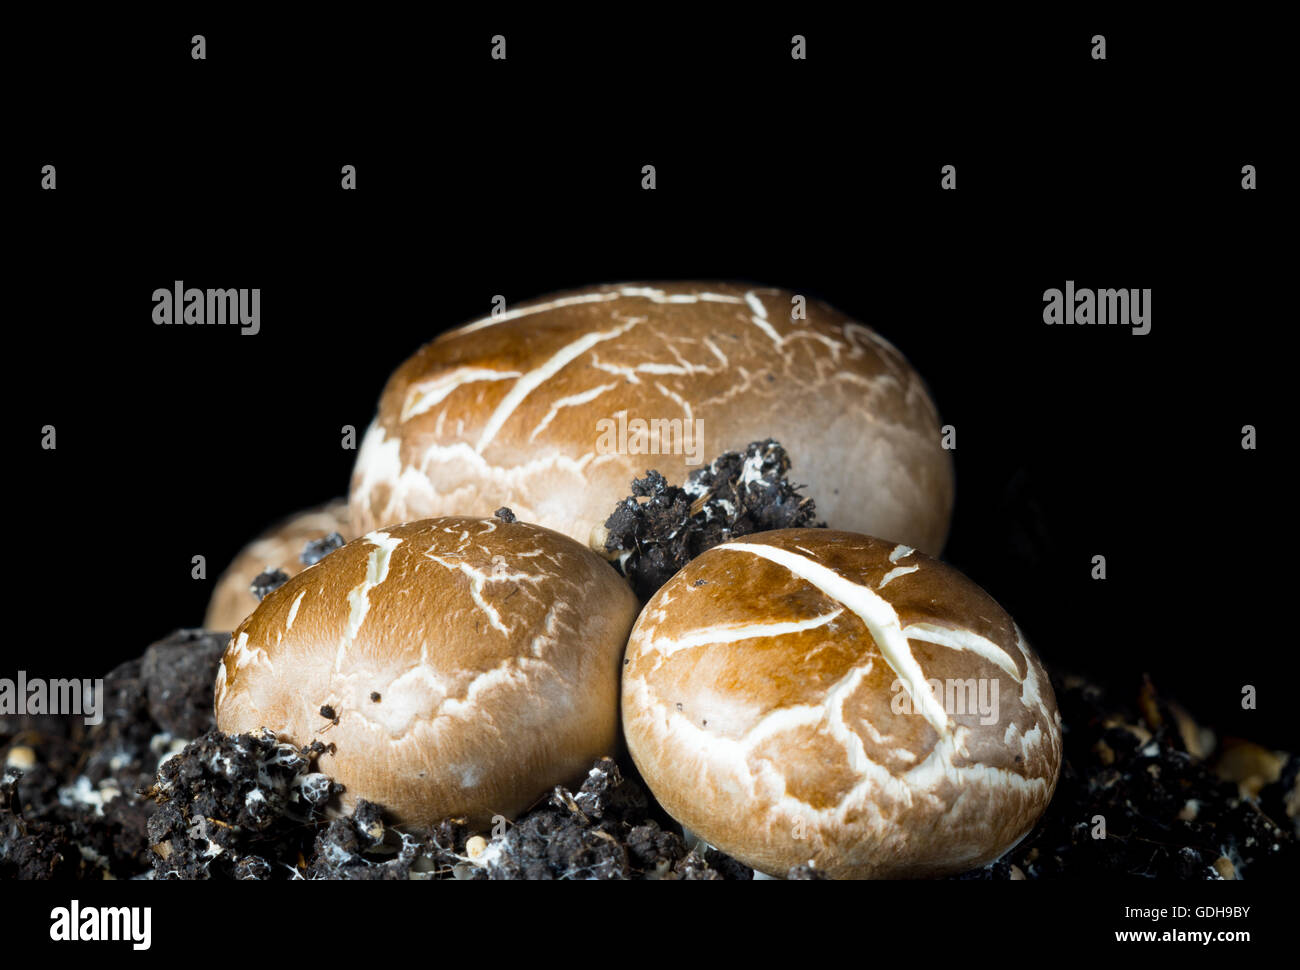 Growing mushrooms champignons - Stock Image